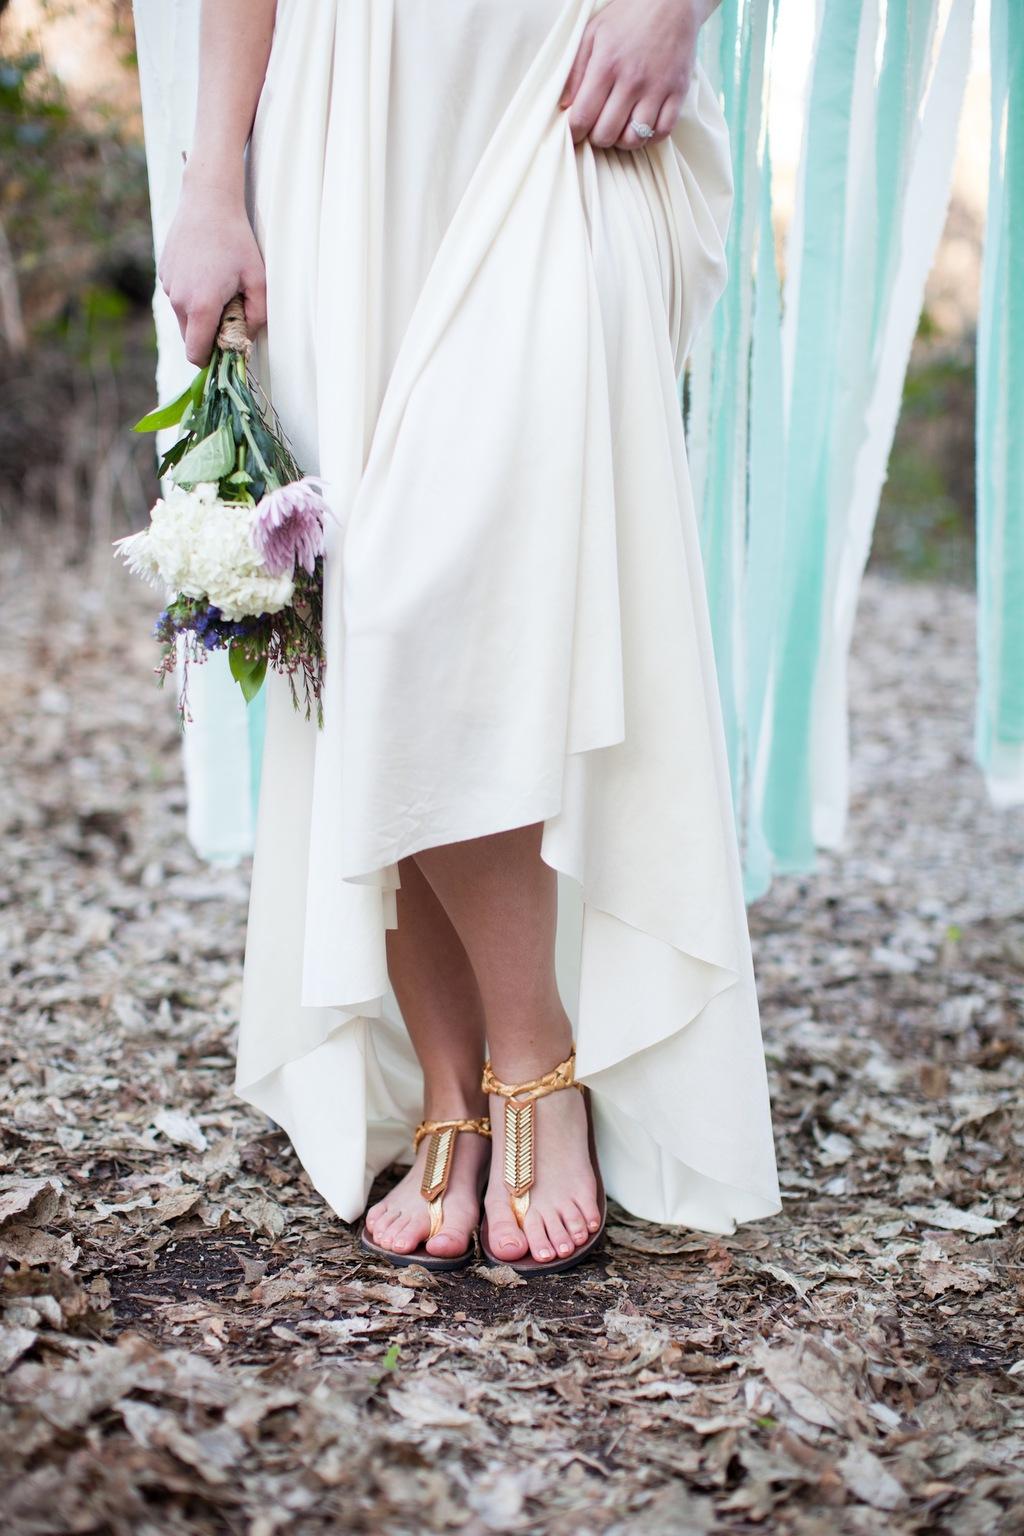 Beach_sandals_for_a_wedding.full